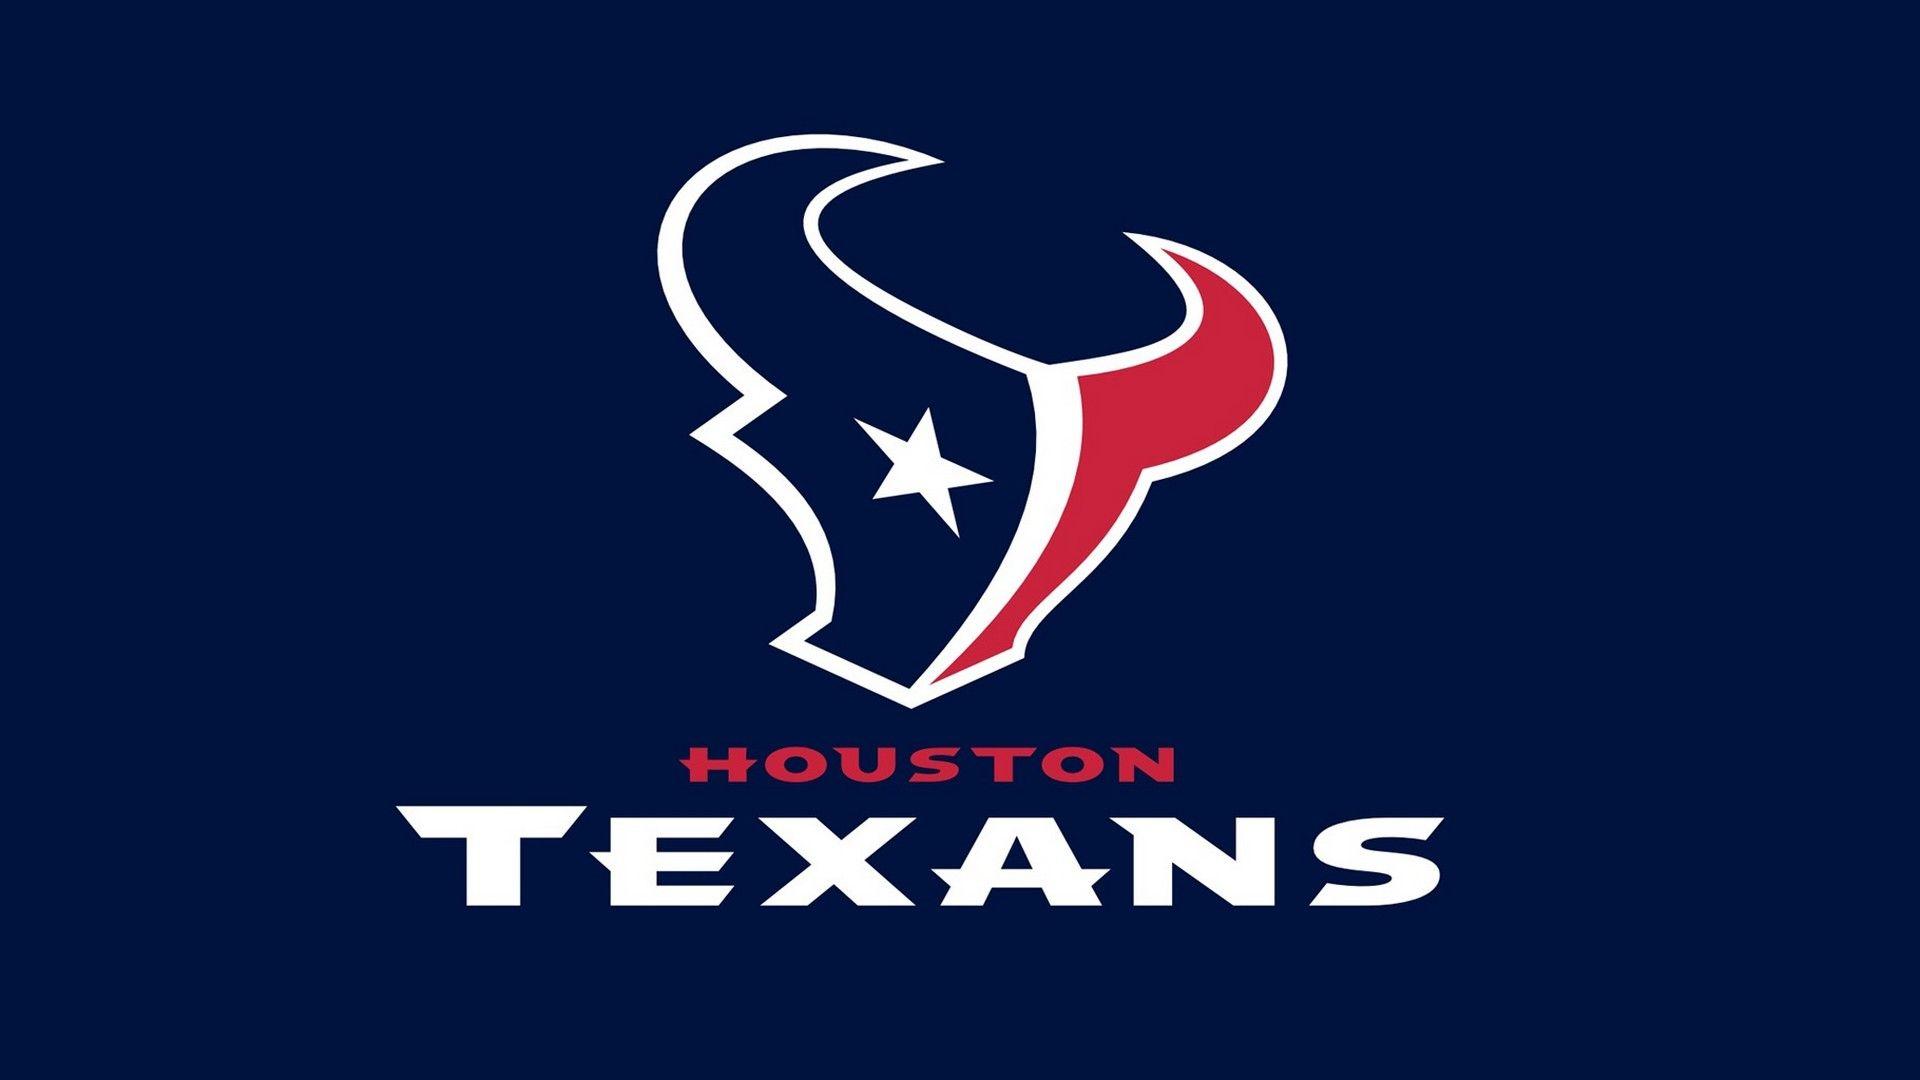 houston texans logo desktop wallpaper 68415